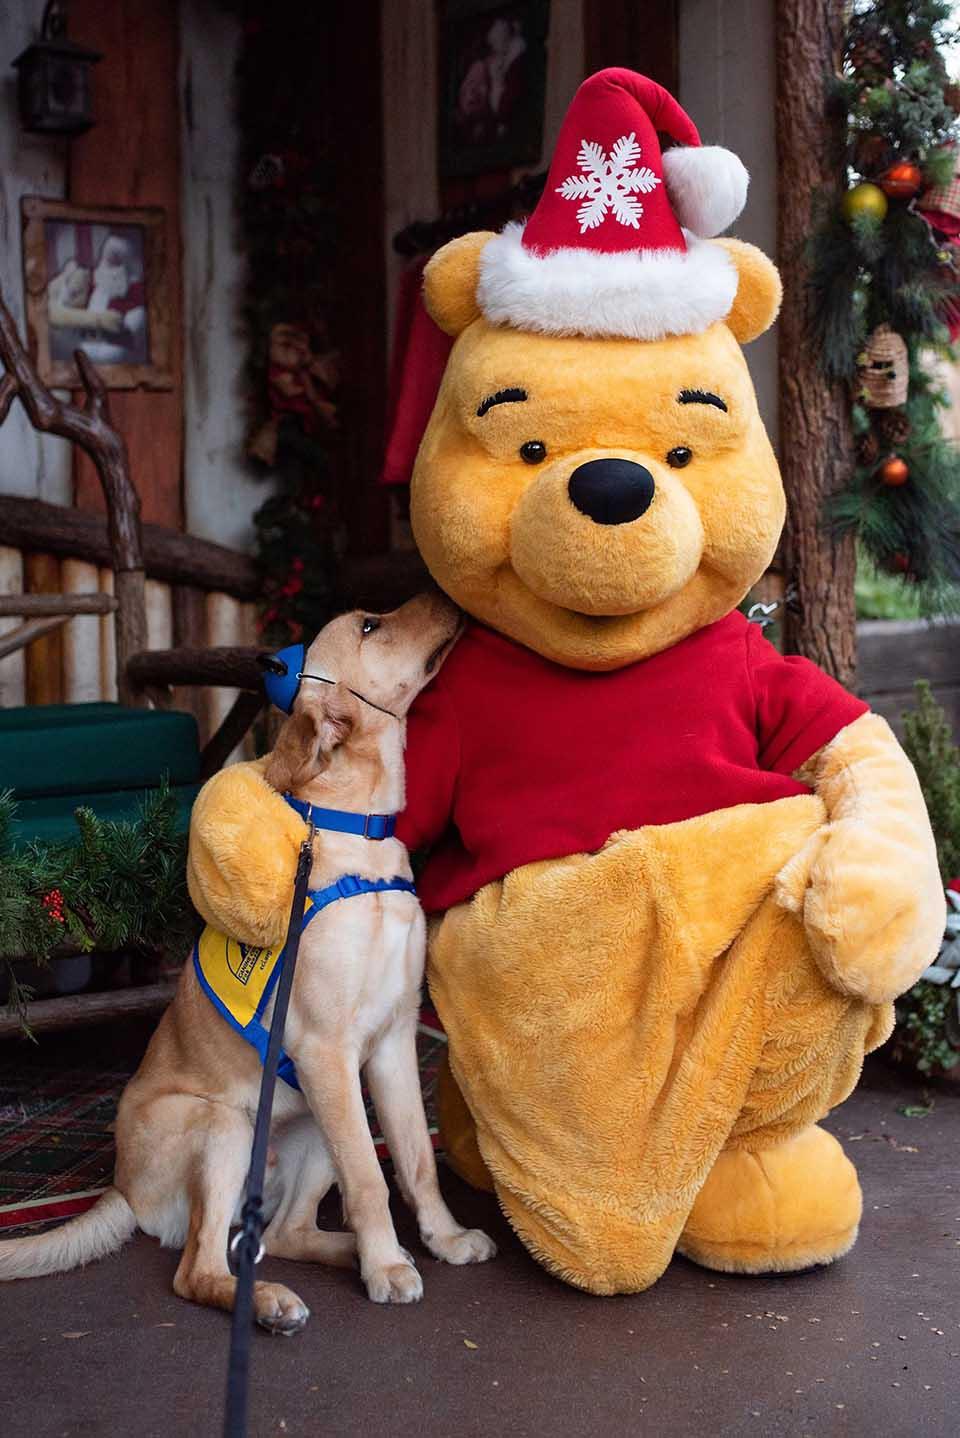 Perro y personaje Winnie Pooh